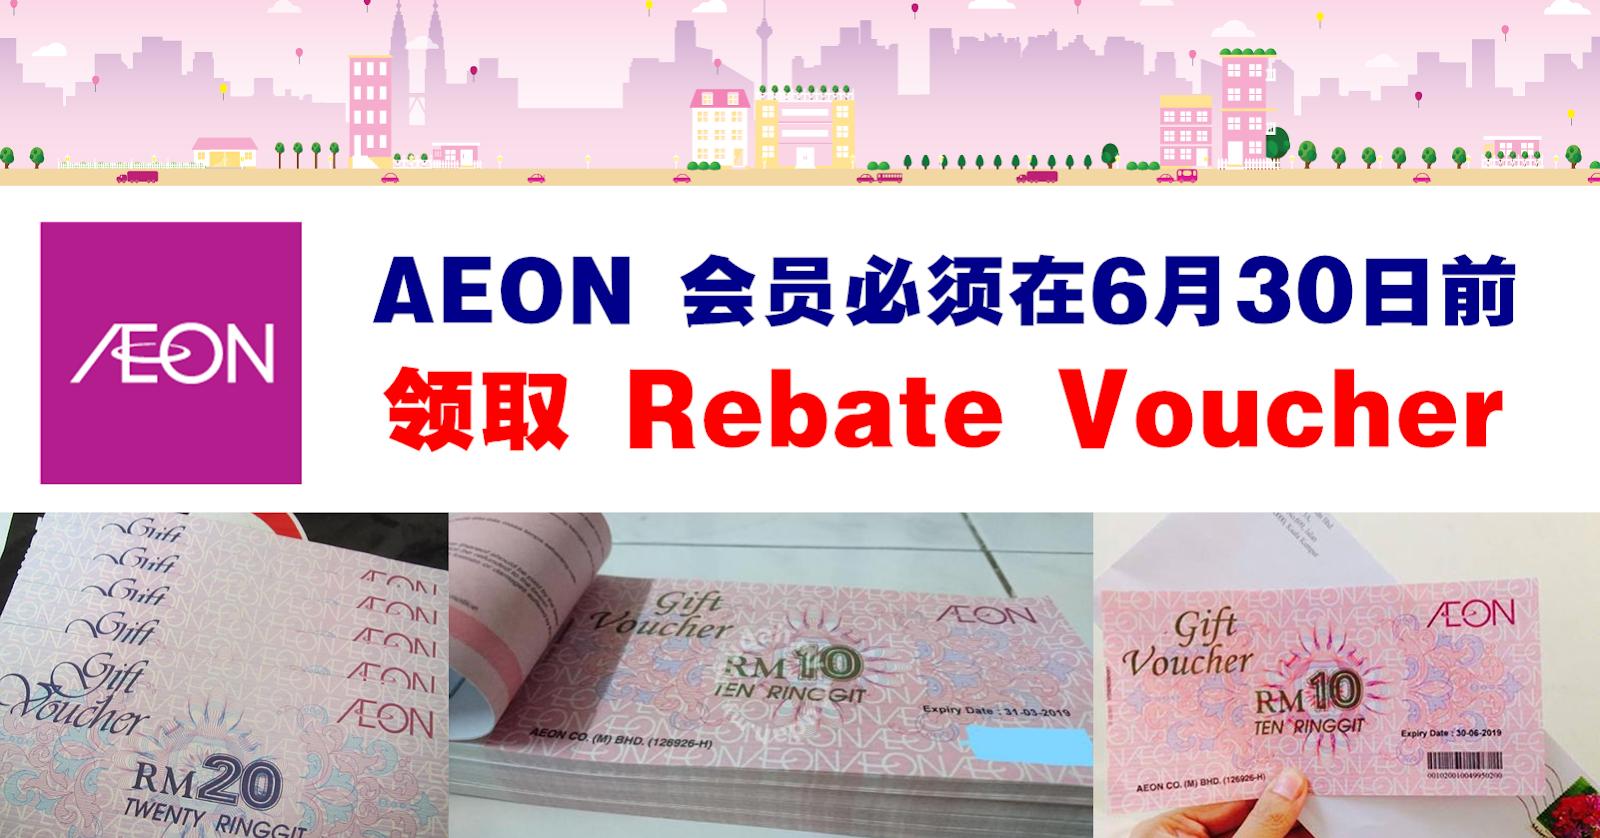 Aeon630rebate Voucher Winrayland Aon Aeon Rebate